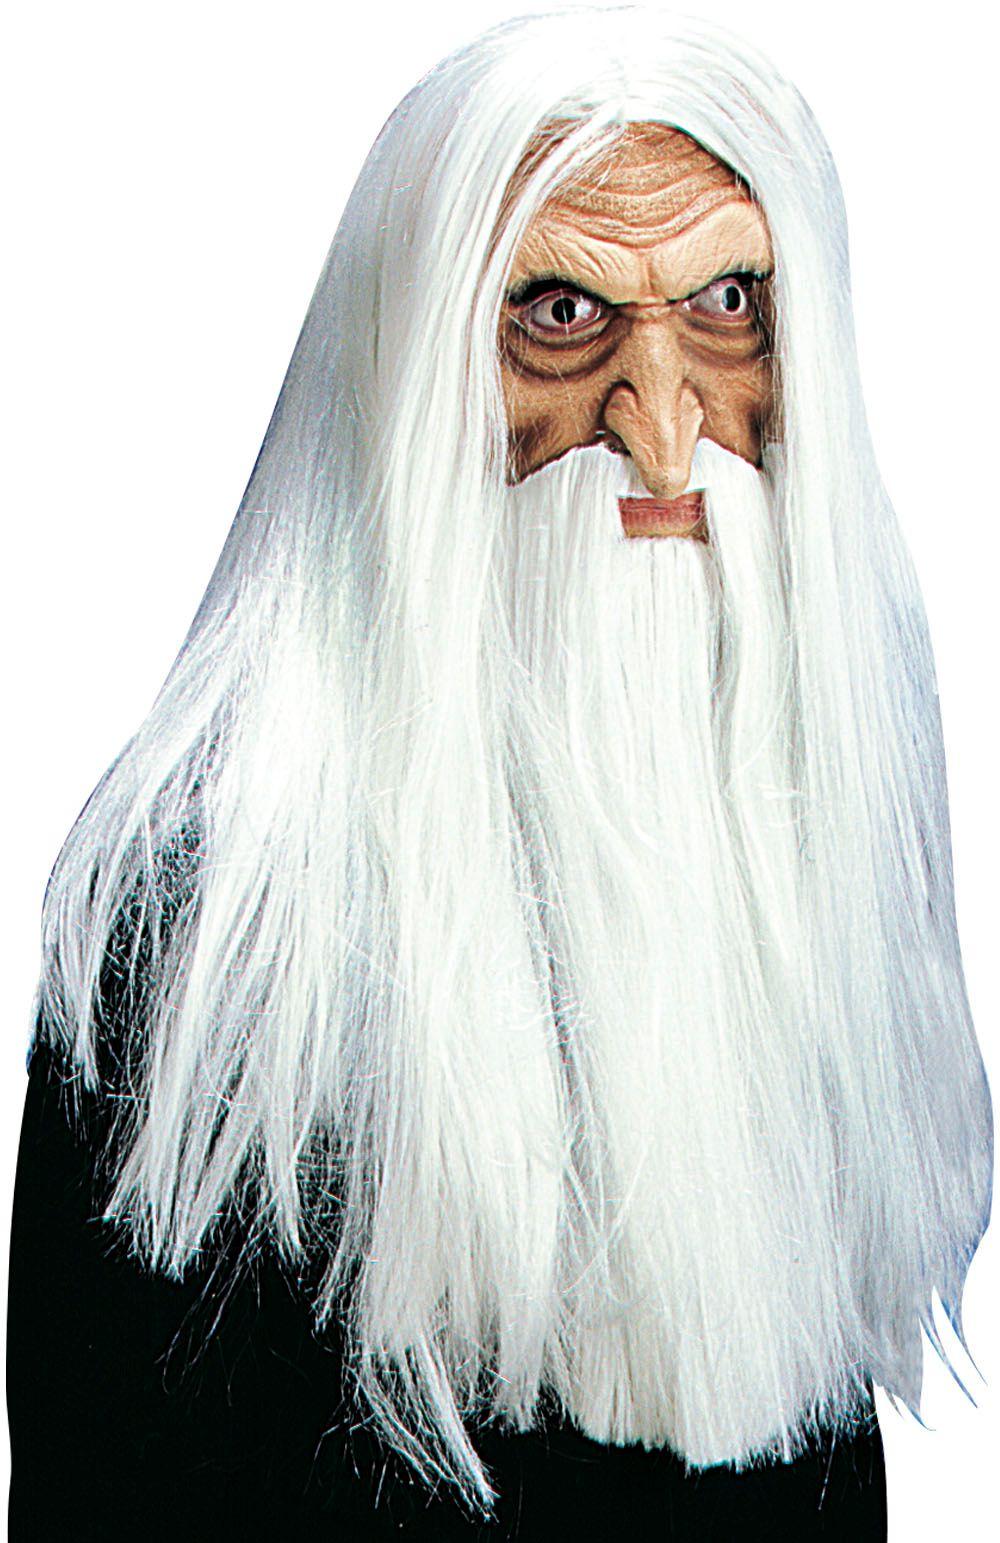 Tovenaars masker met baard en snor